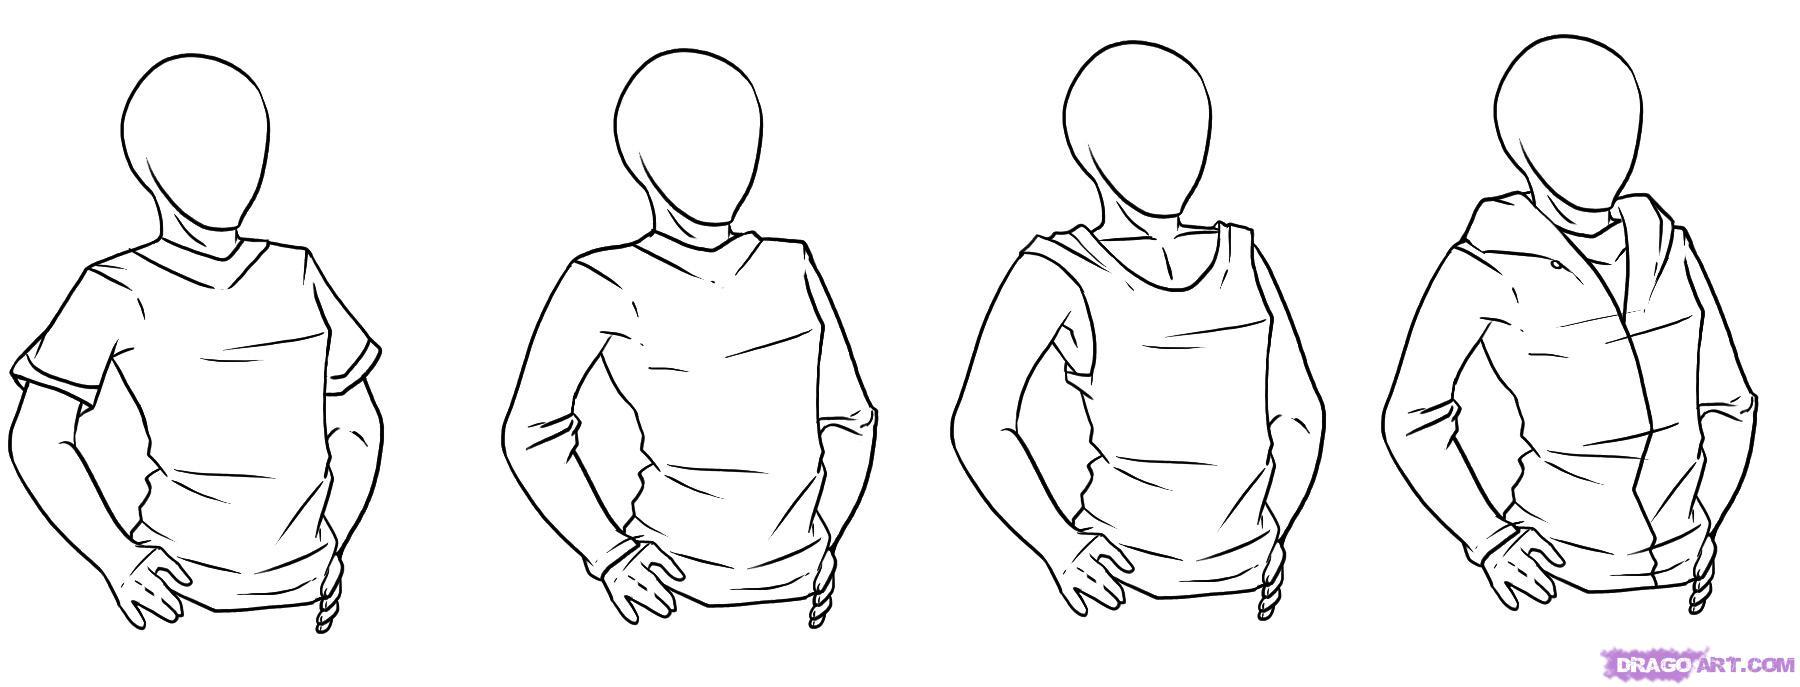 Drawn shirt #3